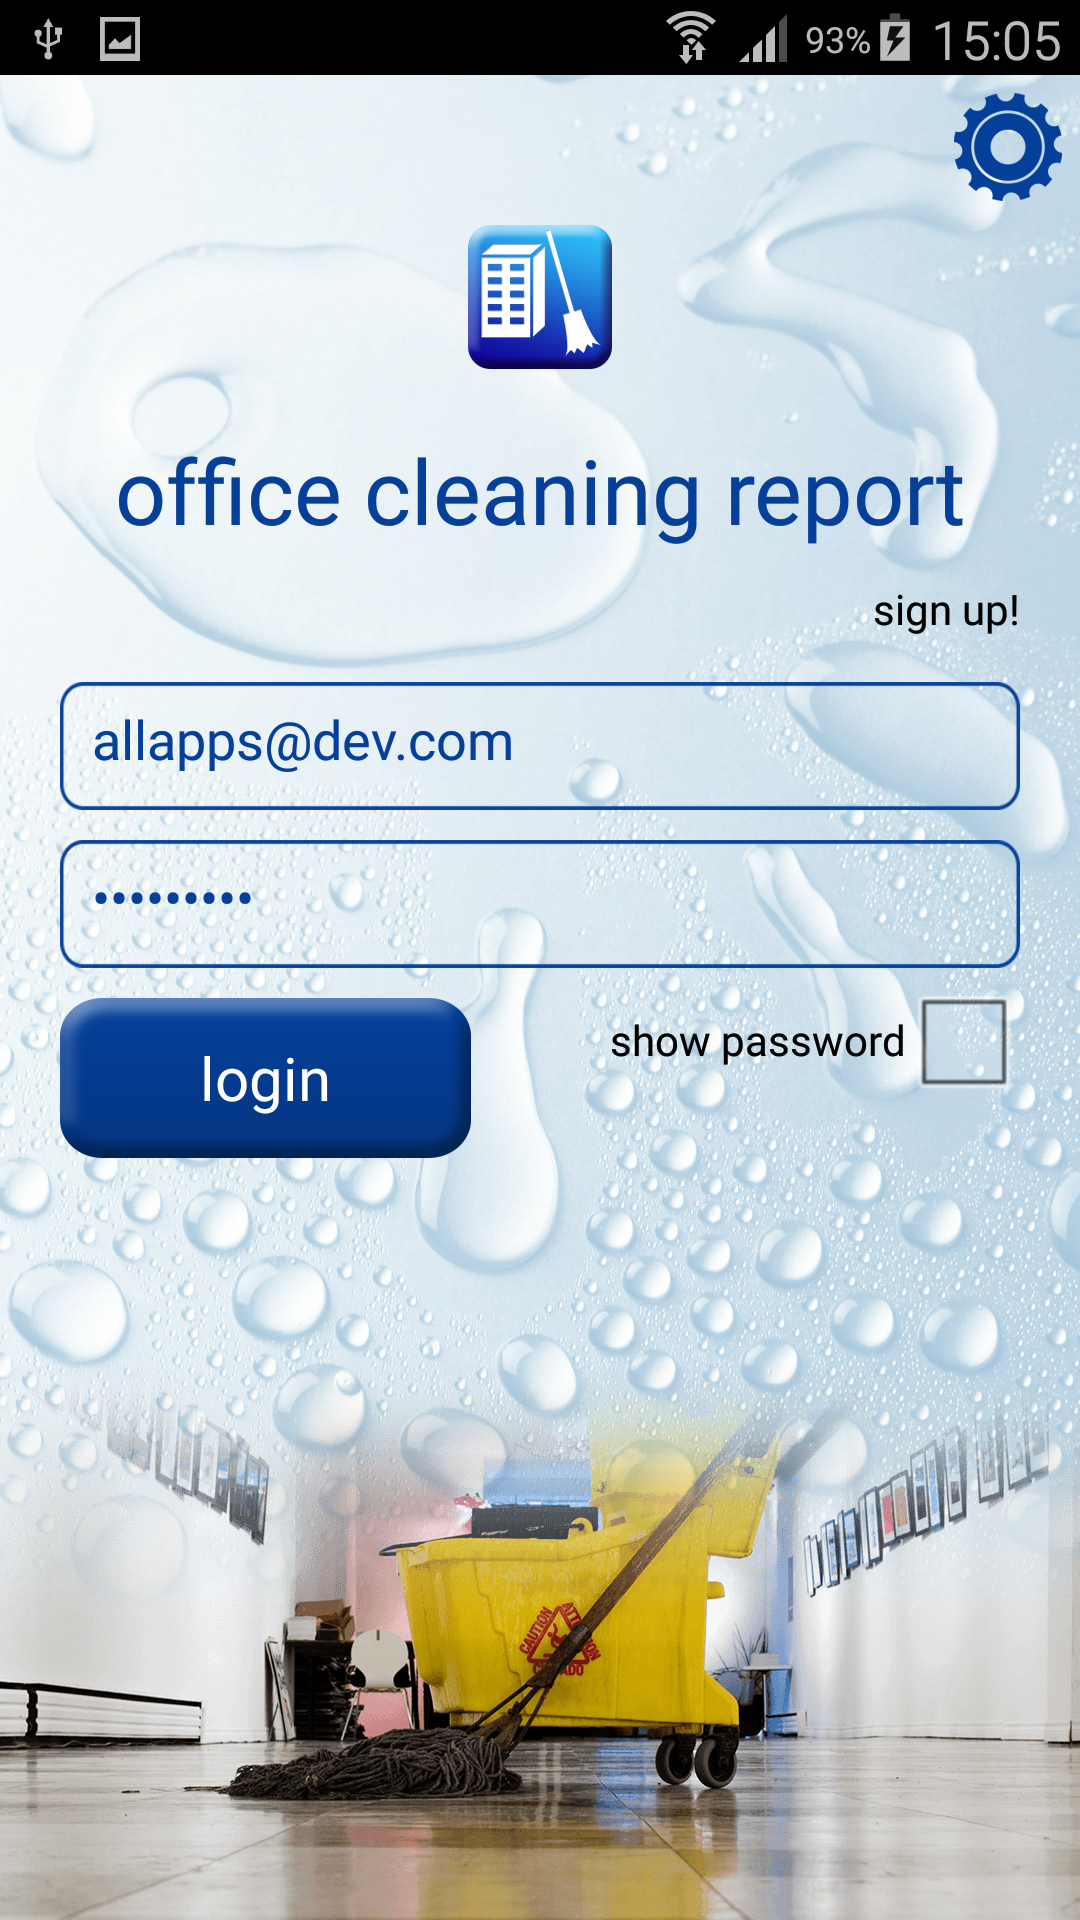 ginstr_app_officeCleaningReport_EN_1